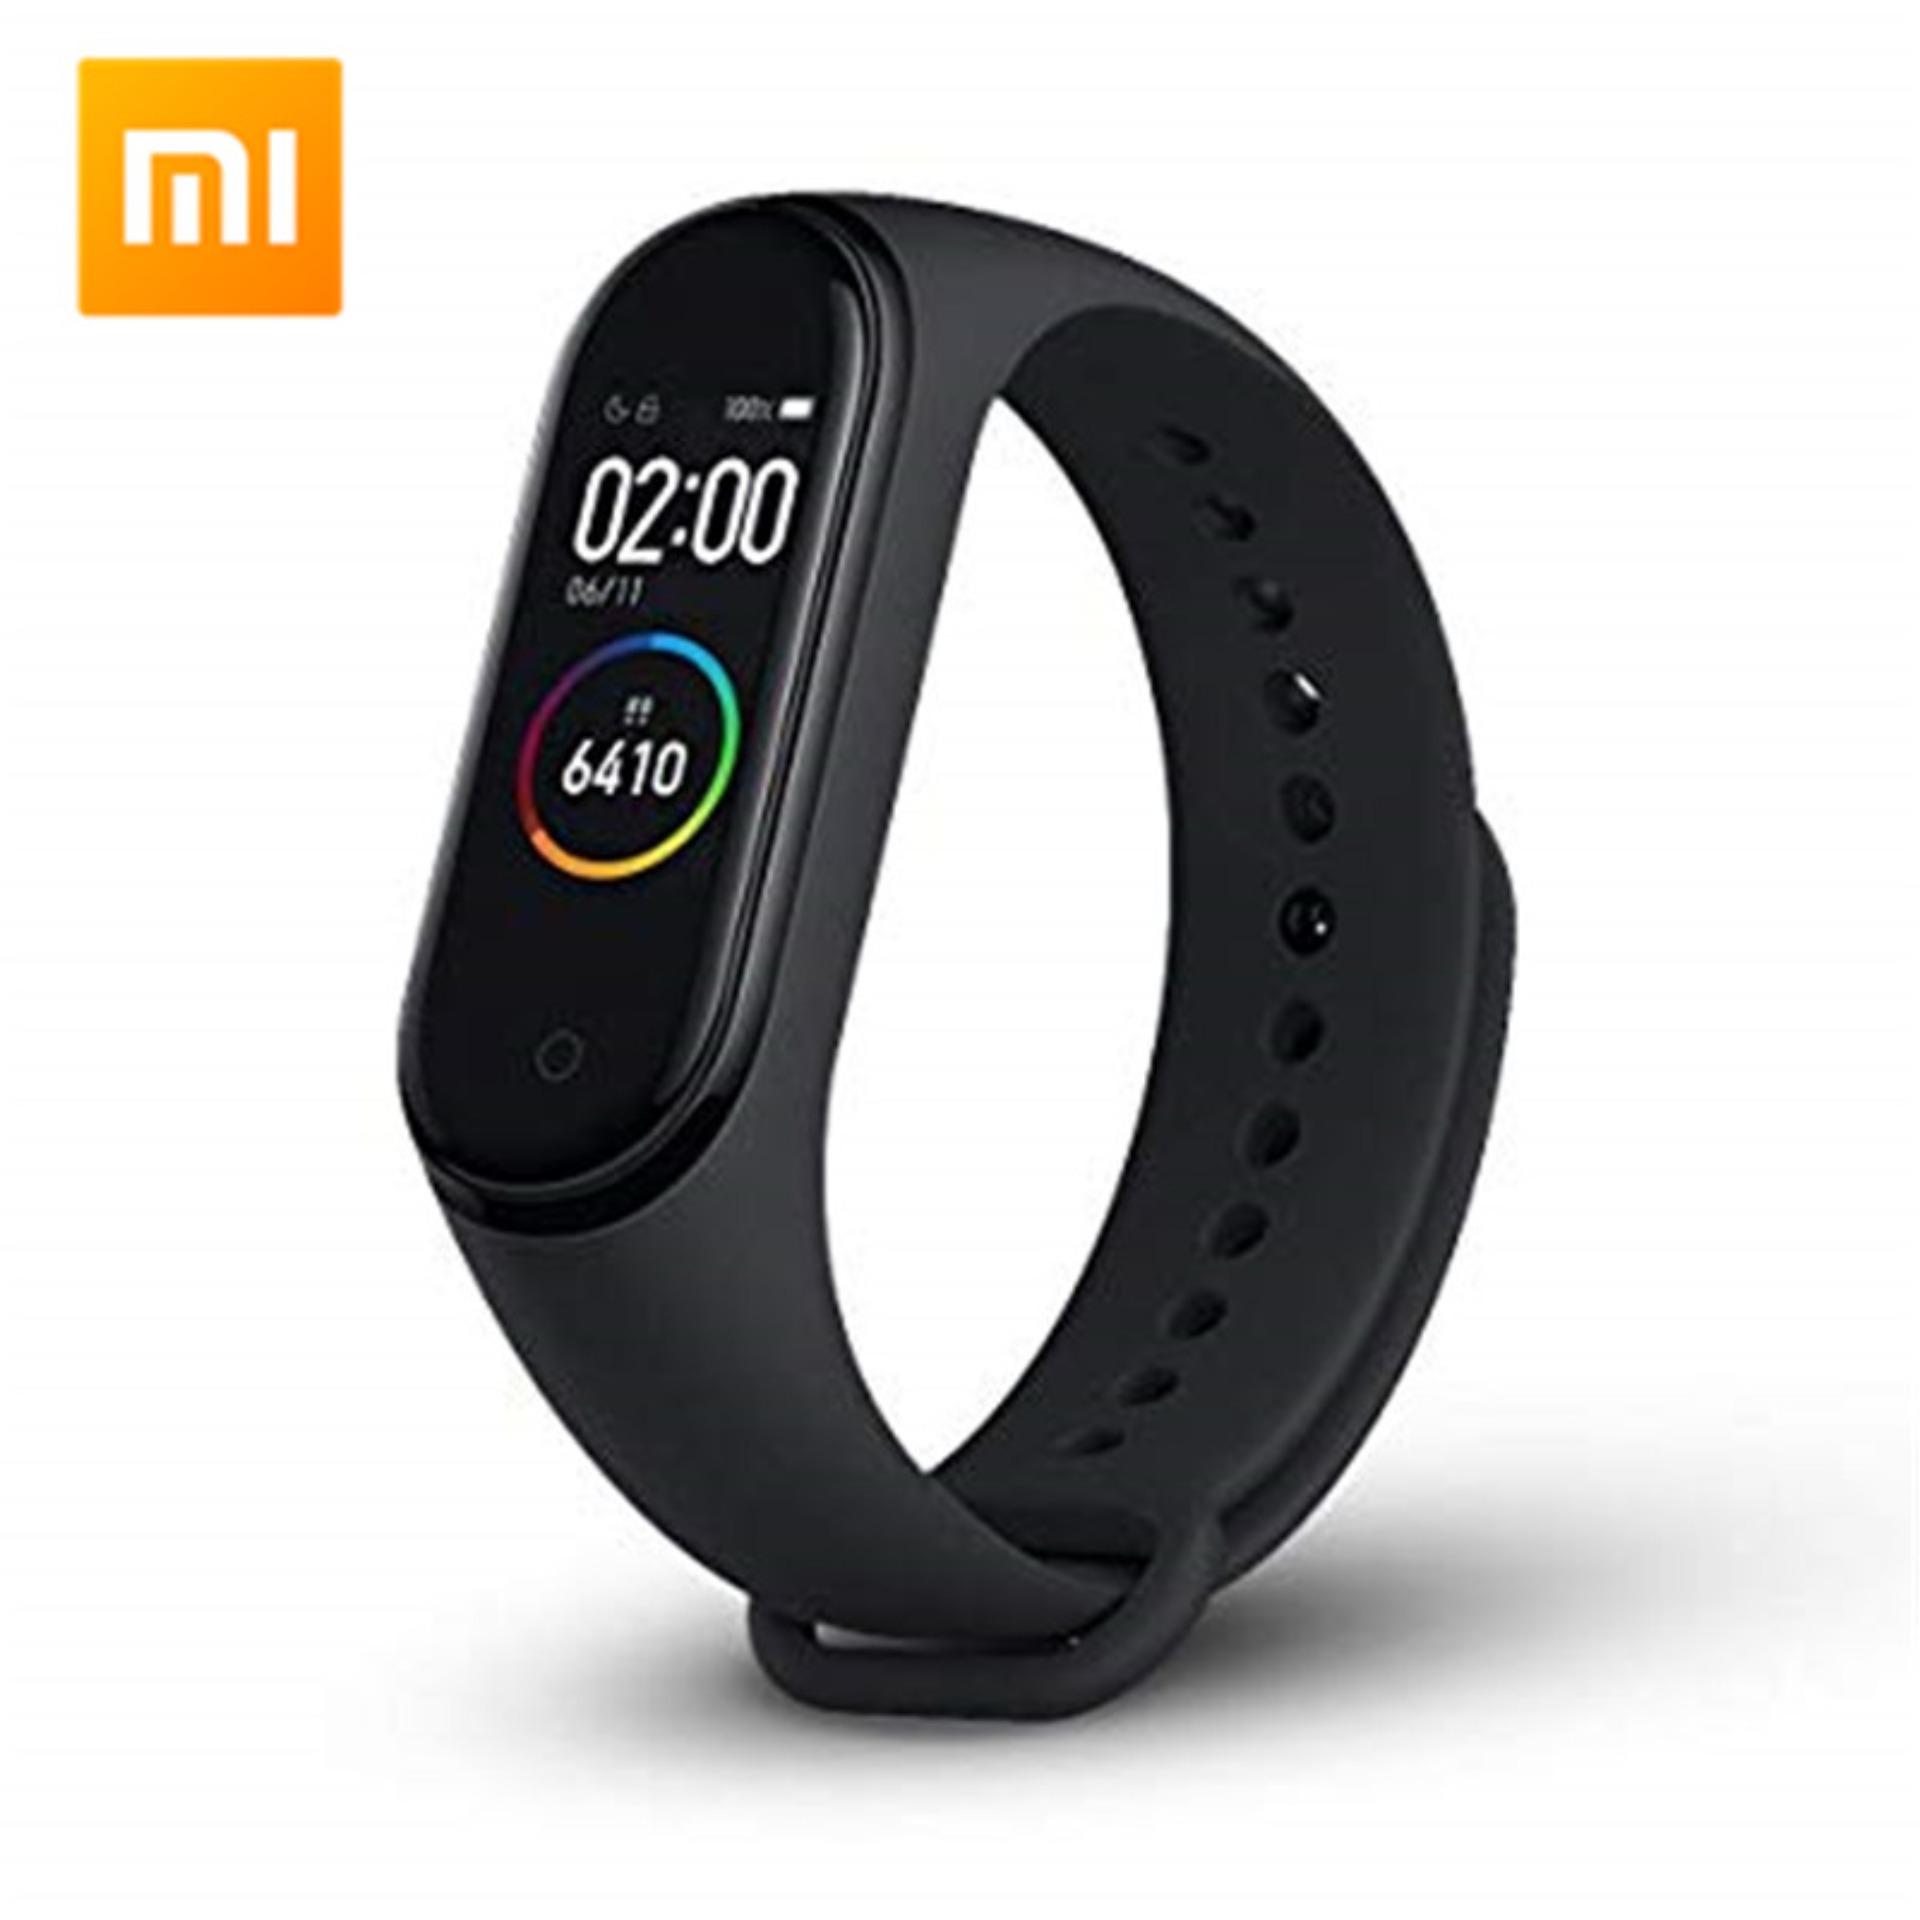 Global Version Xiaomi Mi Band 4 Ready In Stock Smart Bracelet AMOLED Screen Miband 4 Fitness Traker Wristband Bluetooth Sport Waterproof Smart Band Giá Tốt Không Nên Bỏ Lỡ